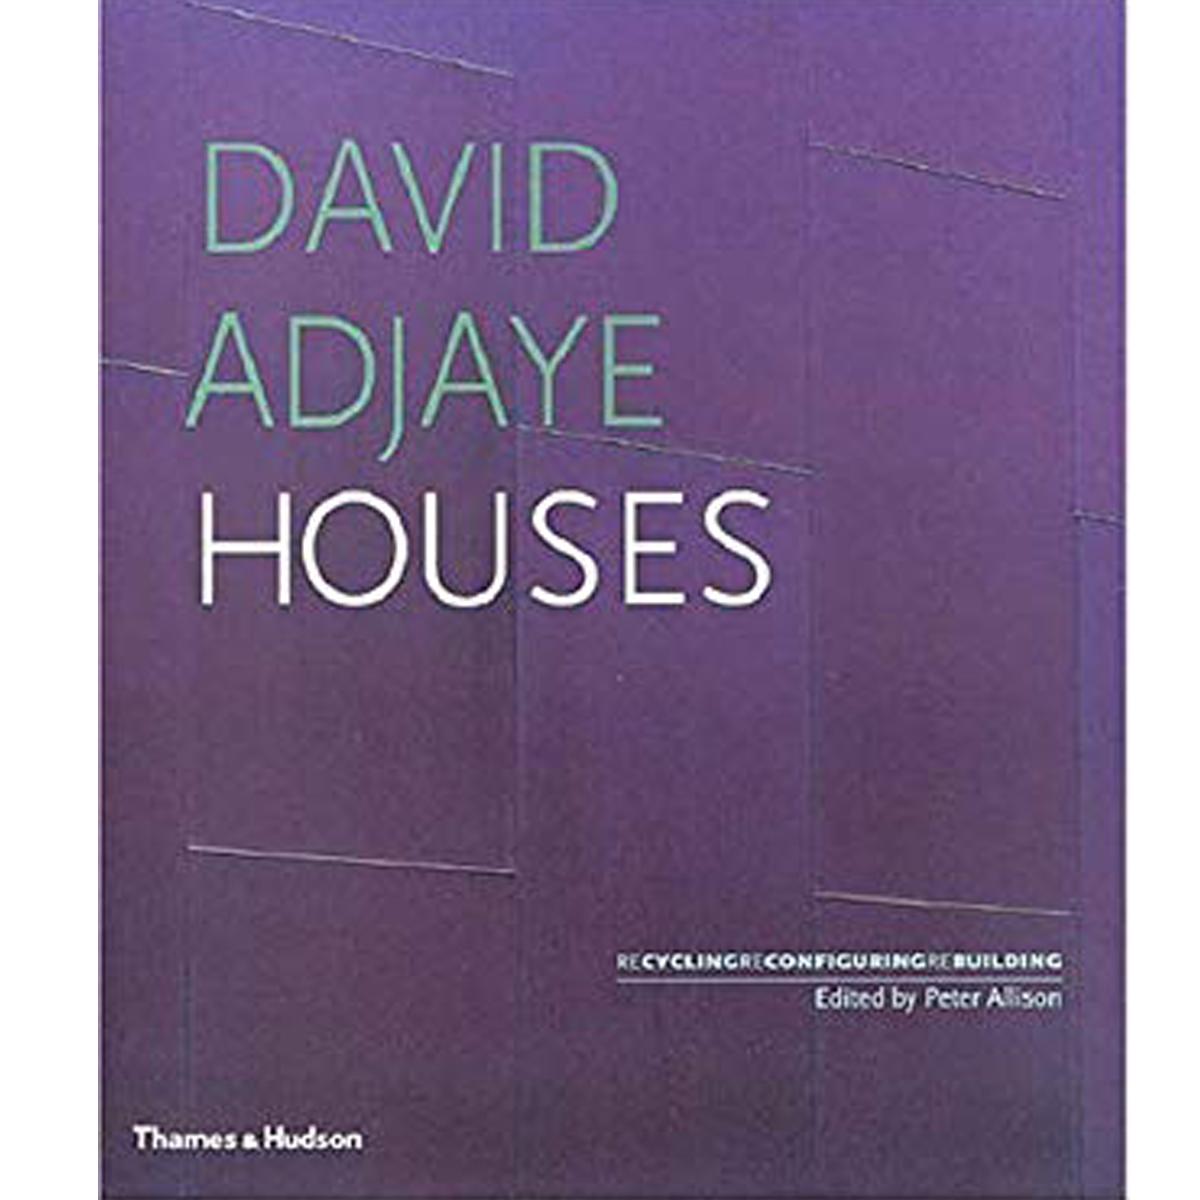 David Adjaye Houses